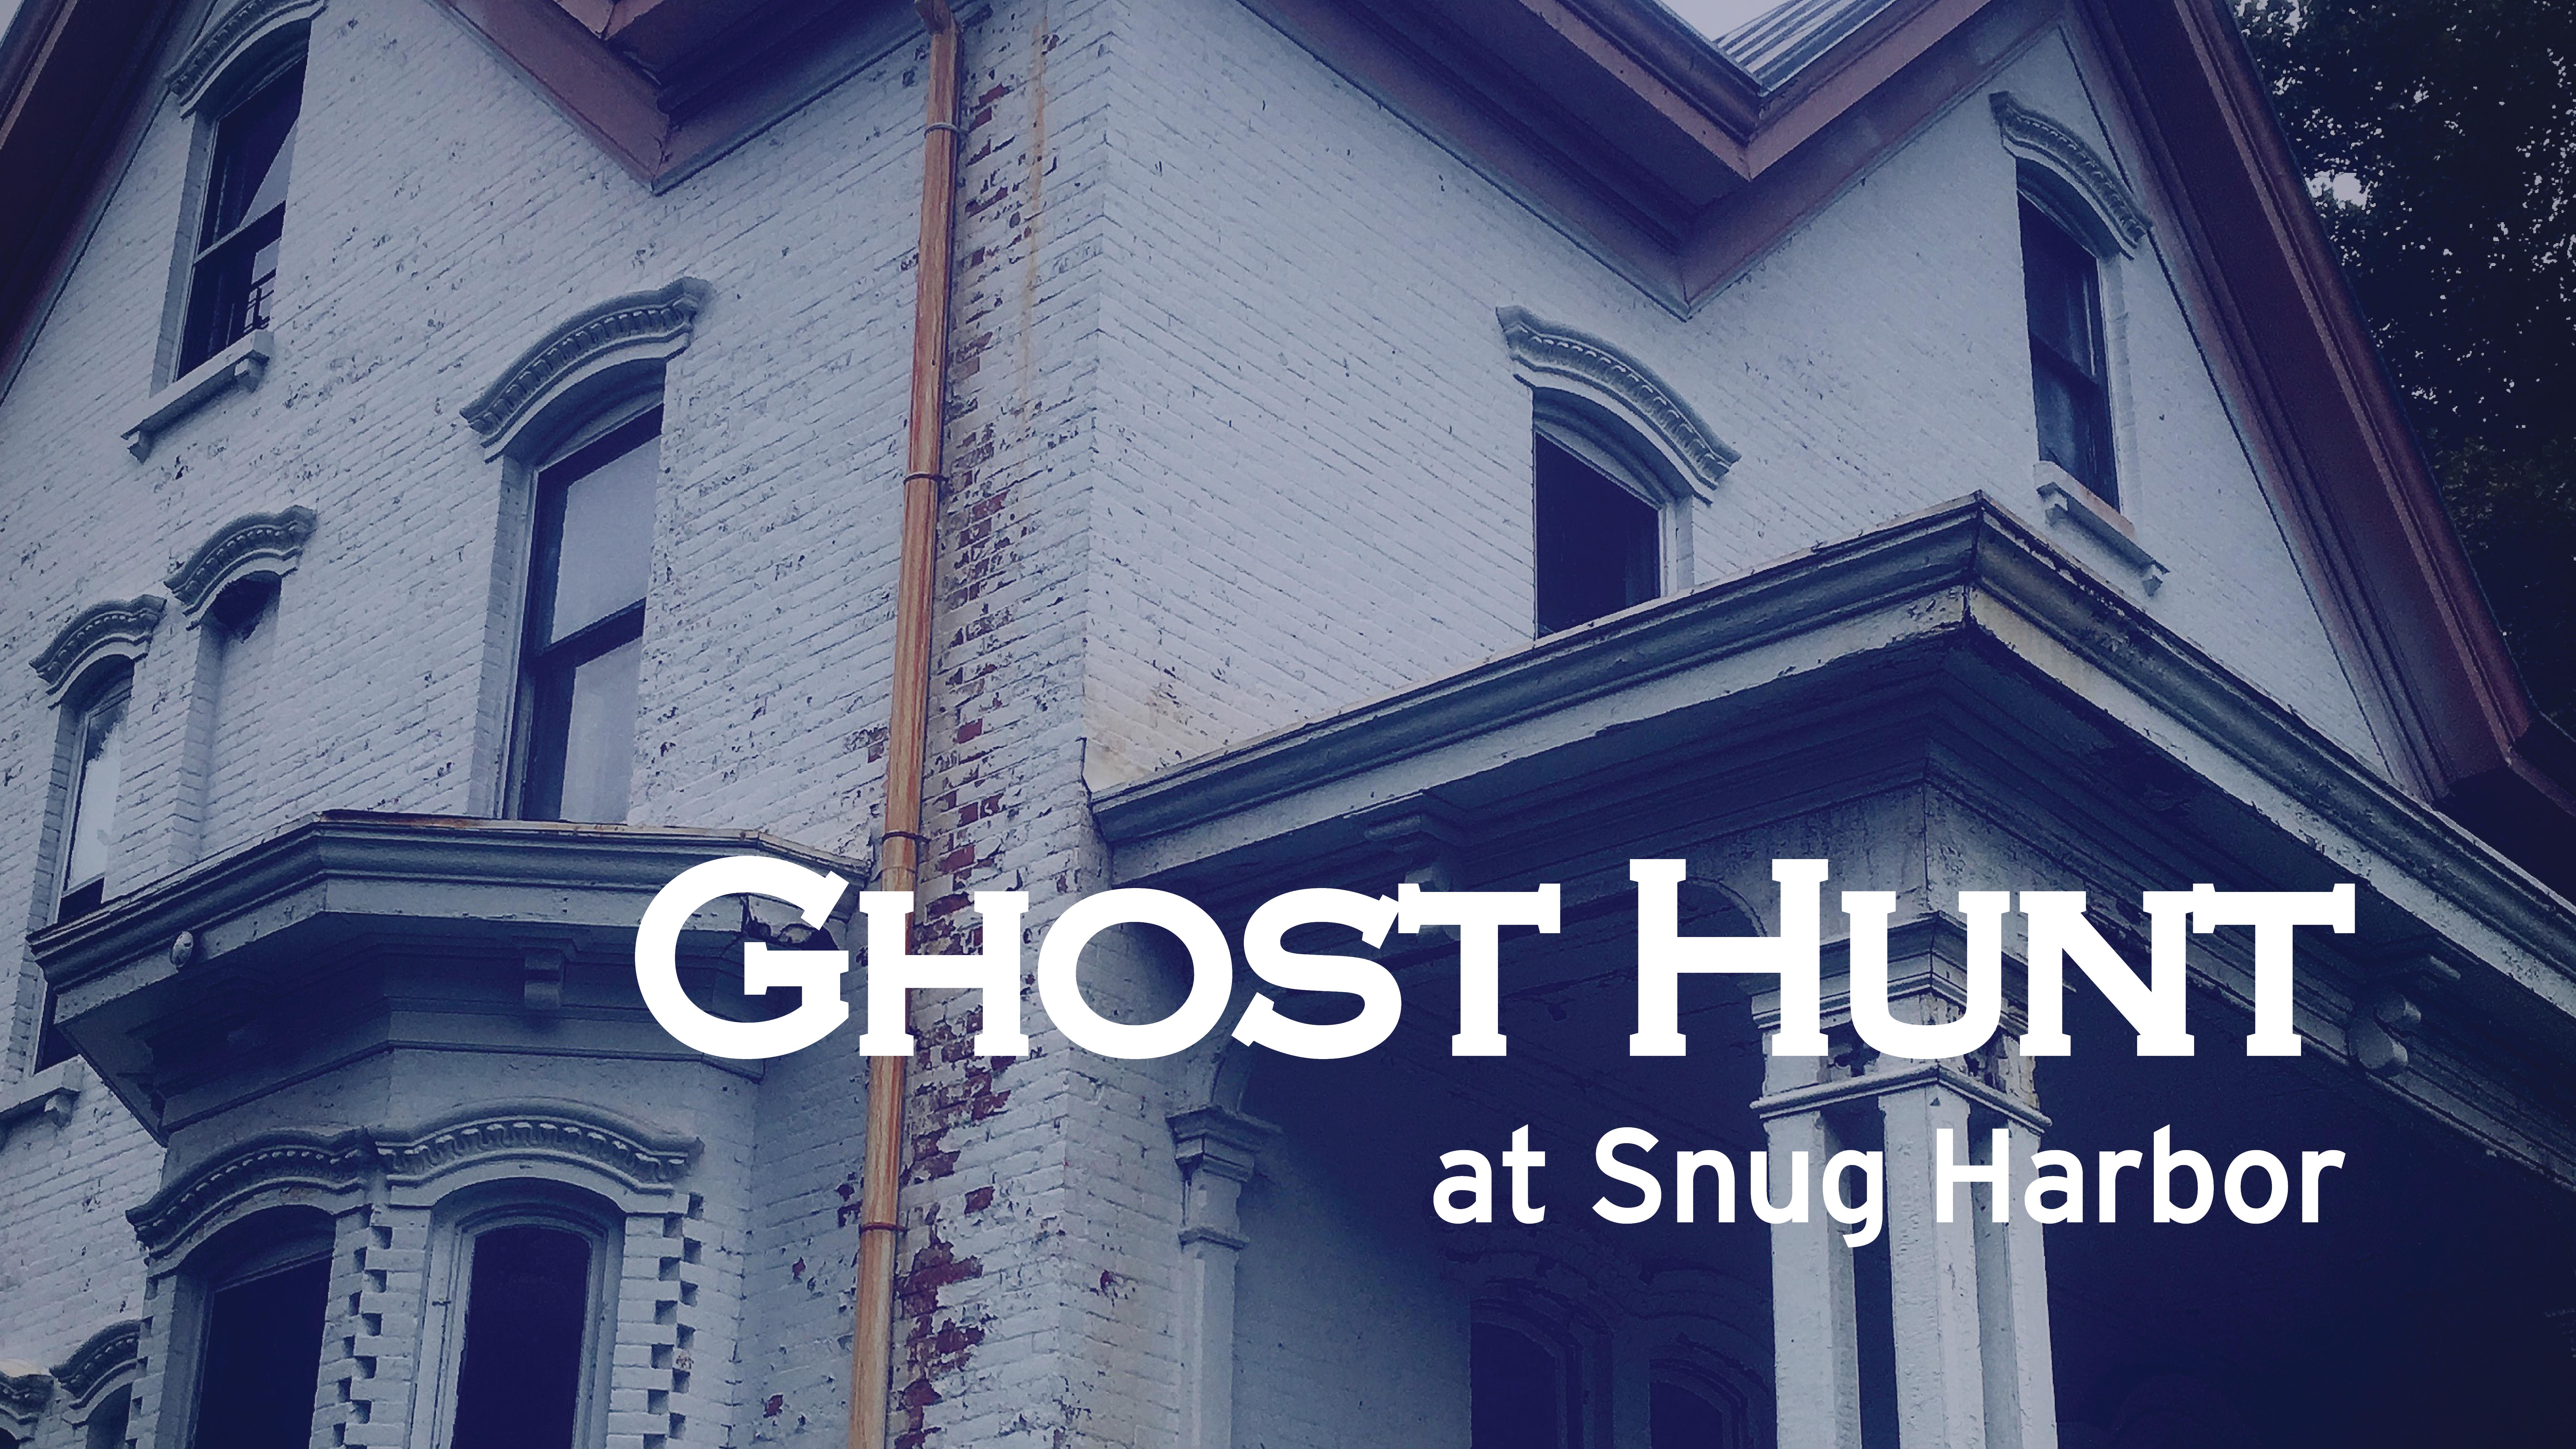 Ghost Hunt at Snug Harbor